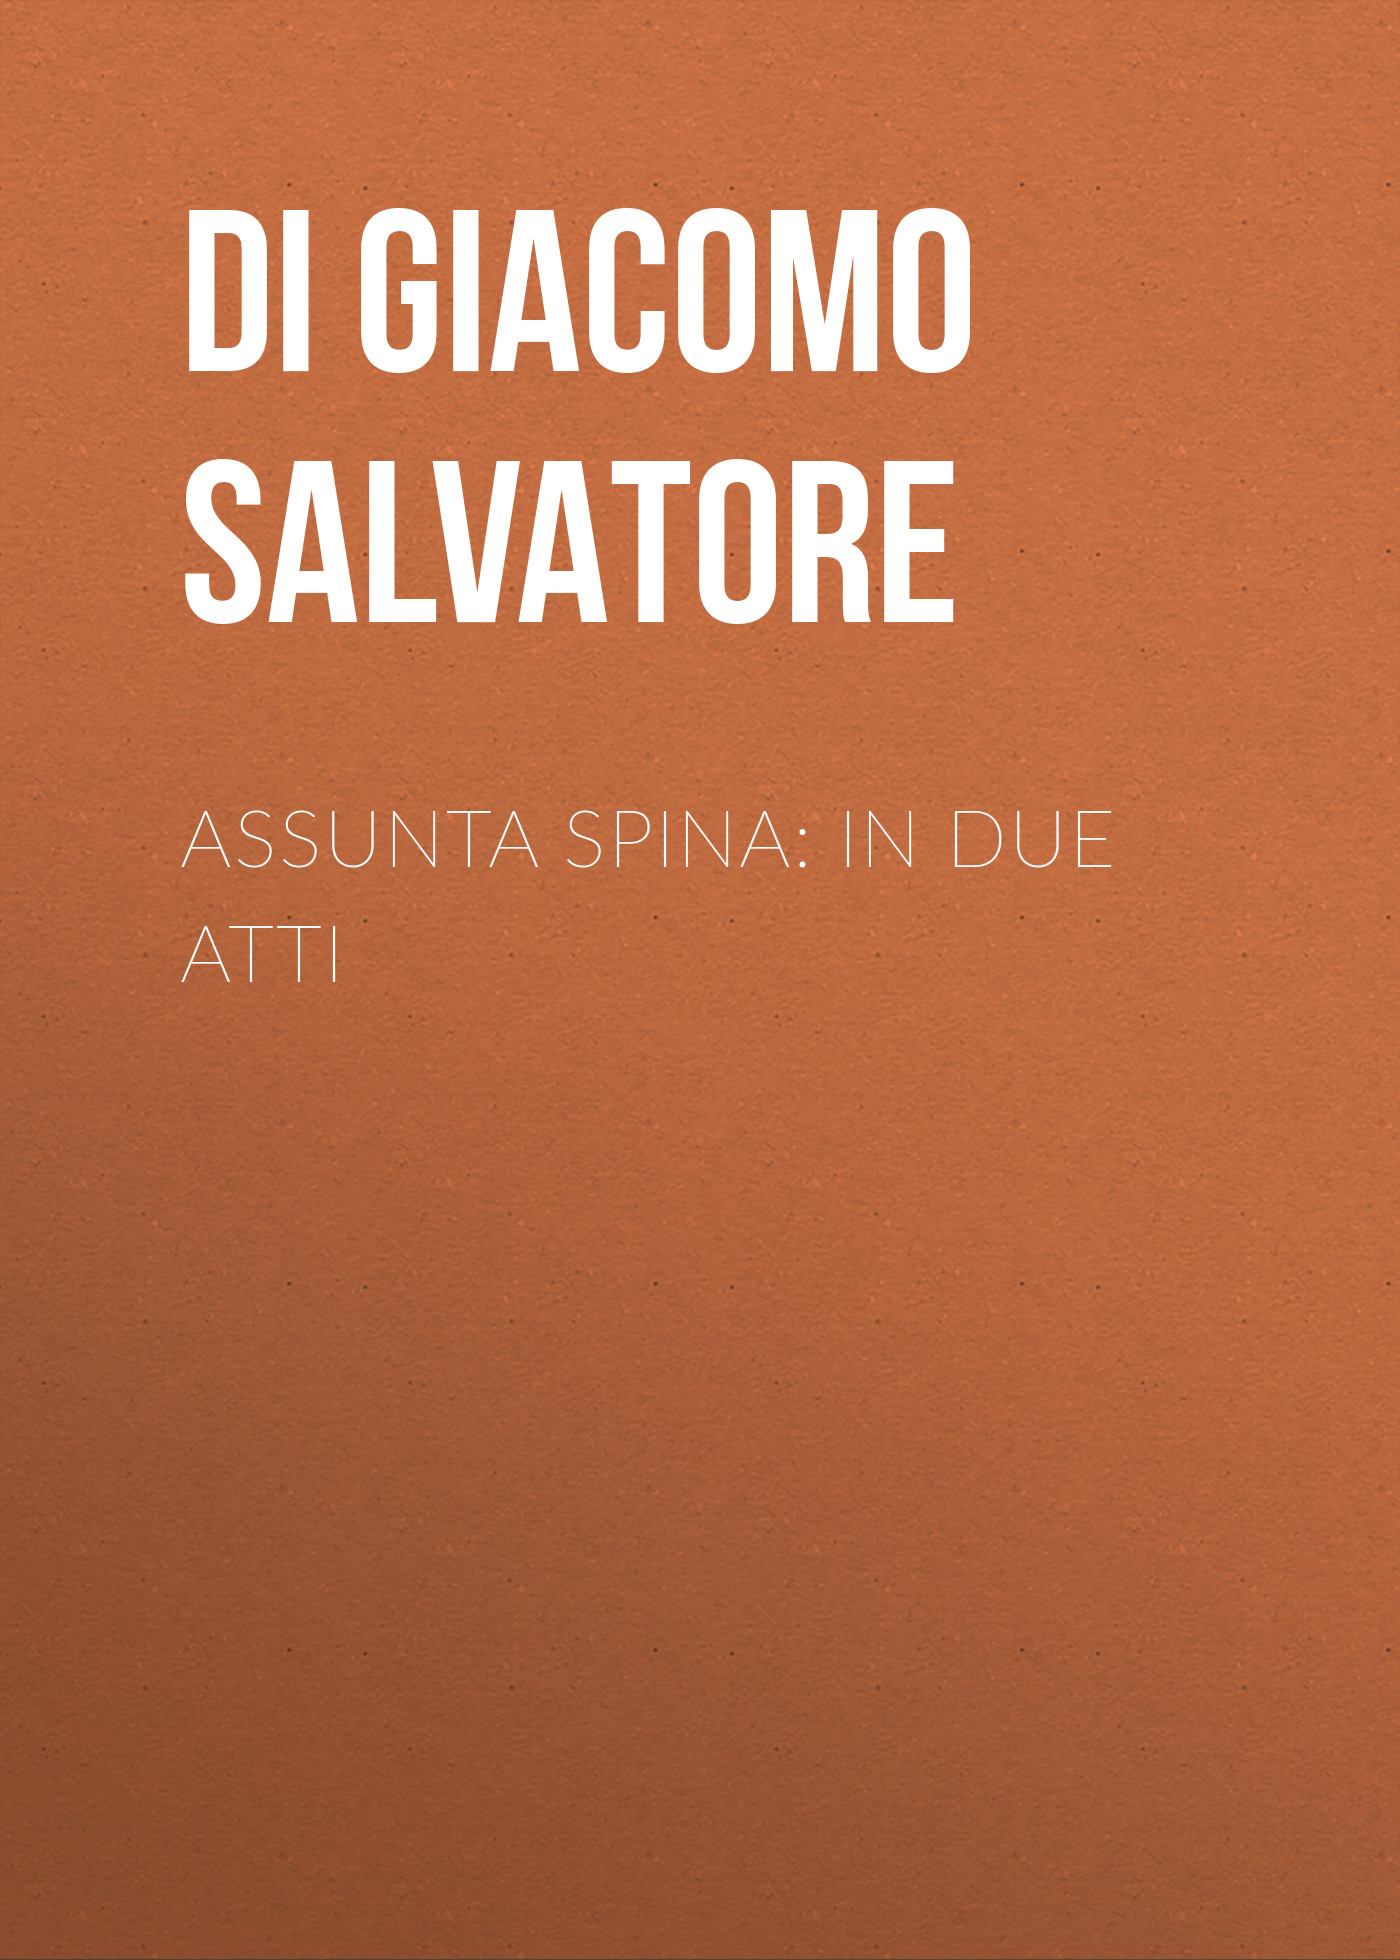 Di Giacomo Salvatore Assunta Spina: In due atti спот spina 56216 3